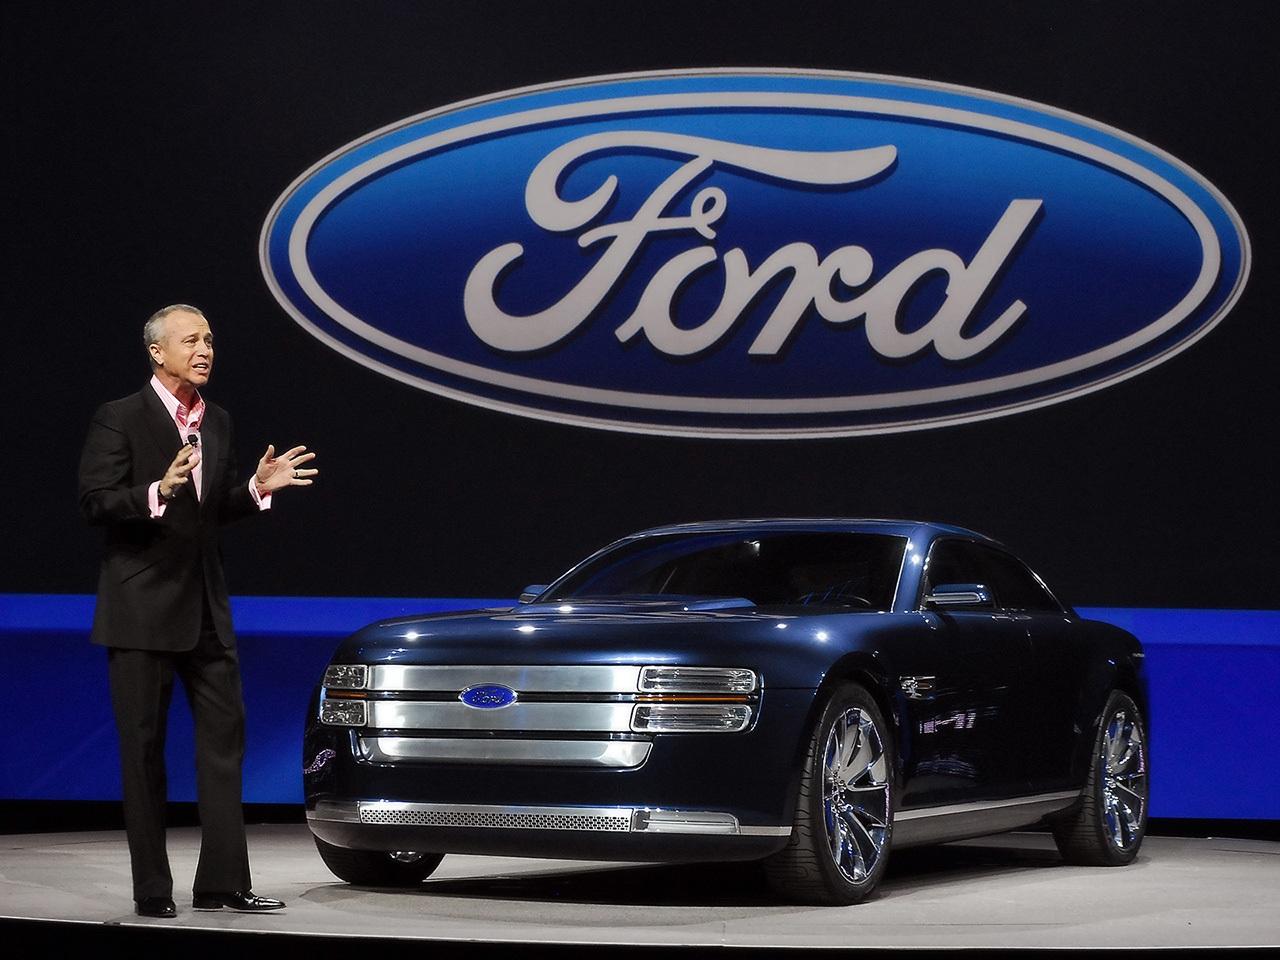 История бренда Ford, эмблема, легендарные автомобили